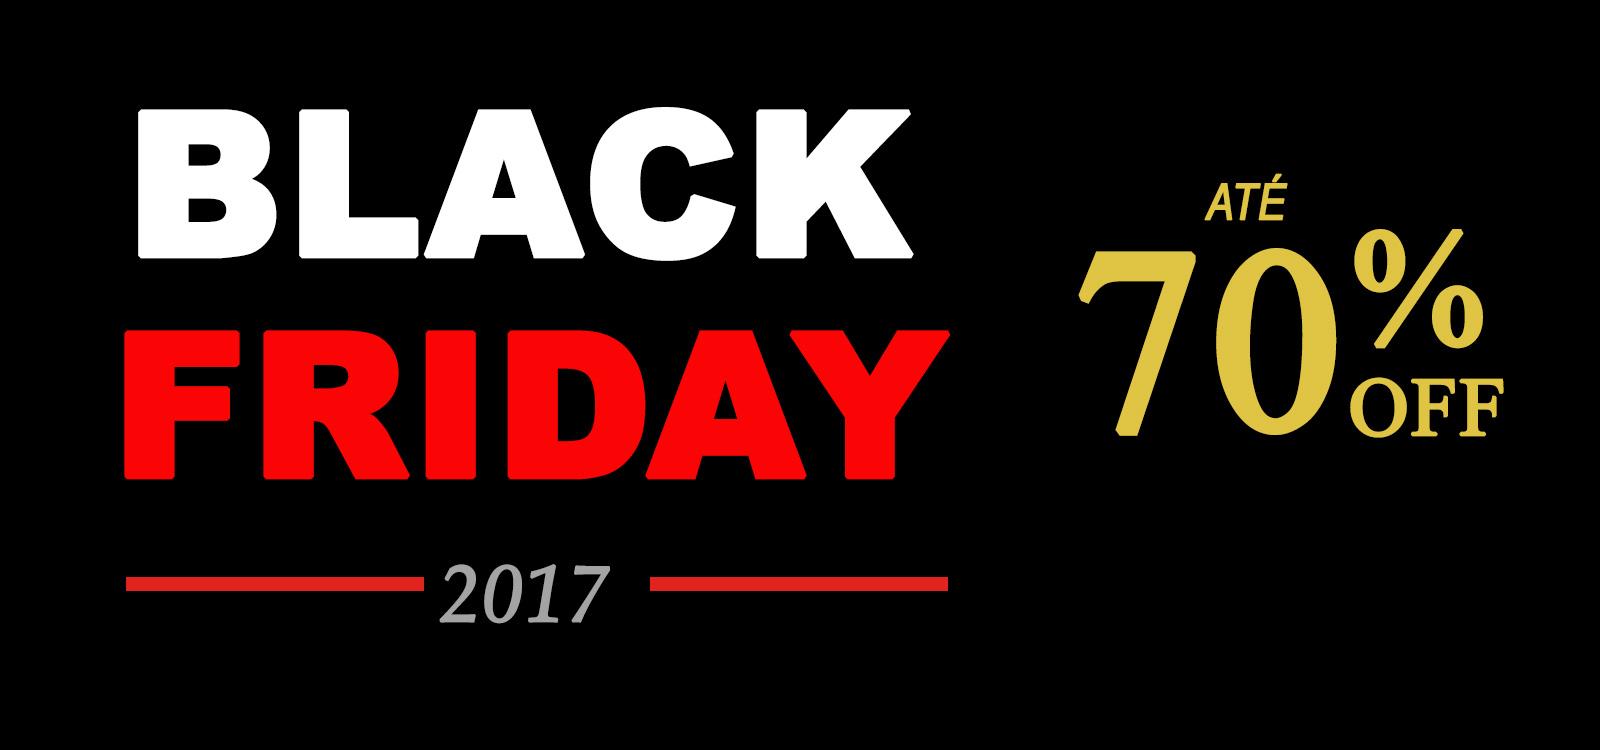 studio bianca machado black friday 2017 at 70 off. Black Bedroom Furniture Sets. Home Design Ideas